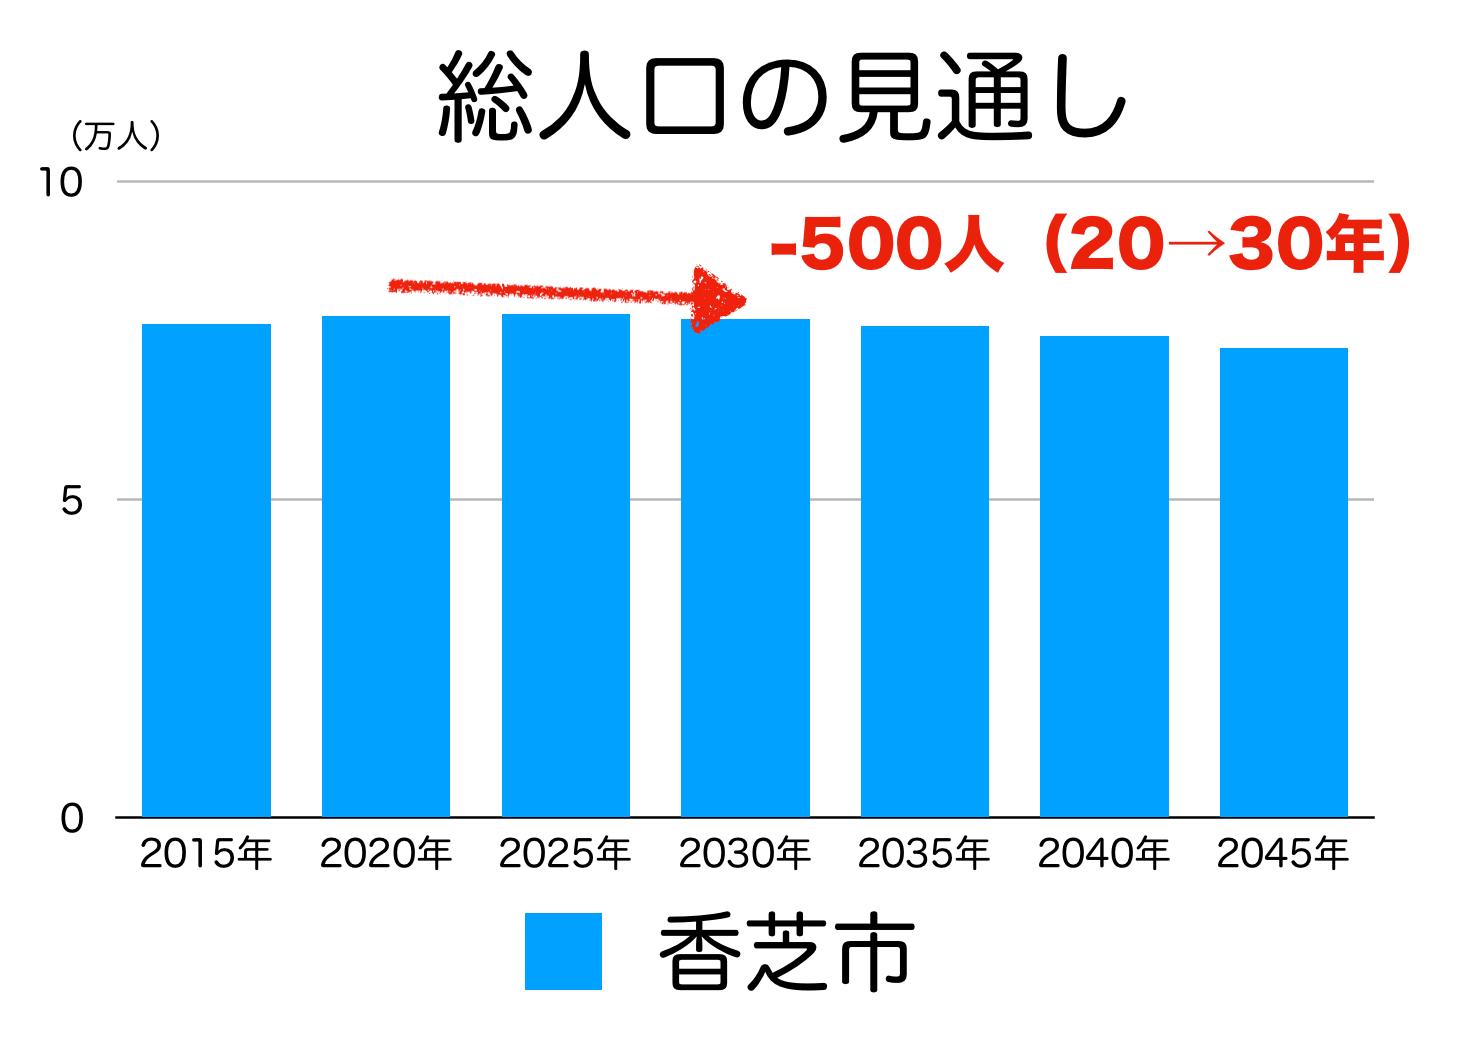 香芝市の人口予測